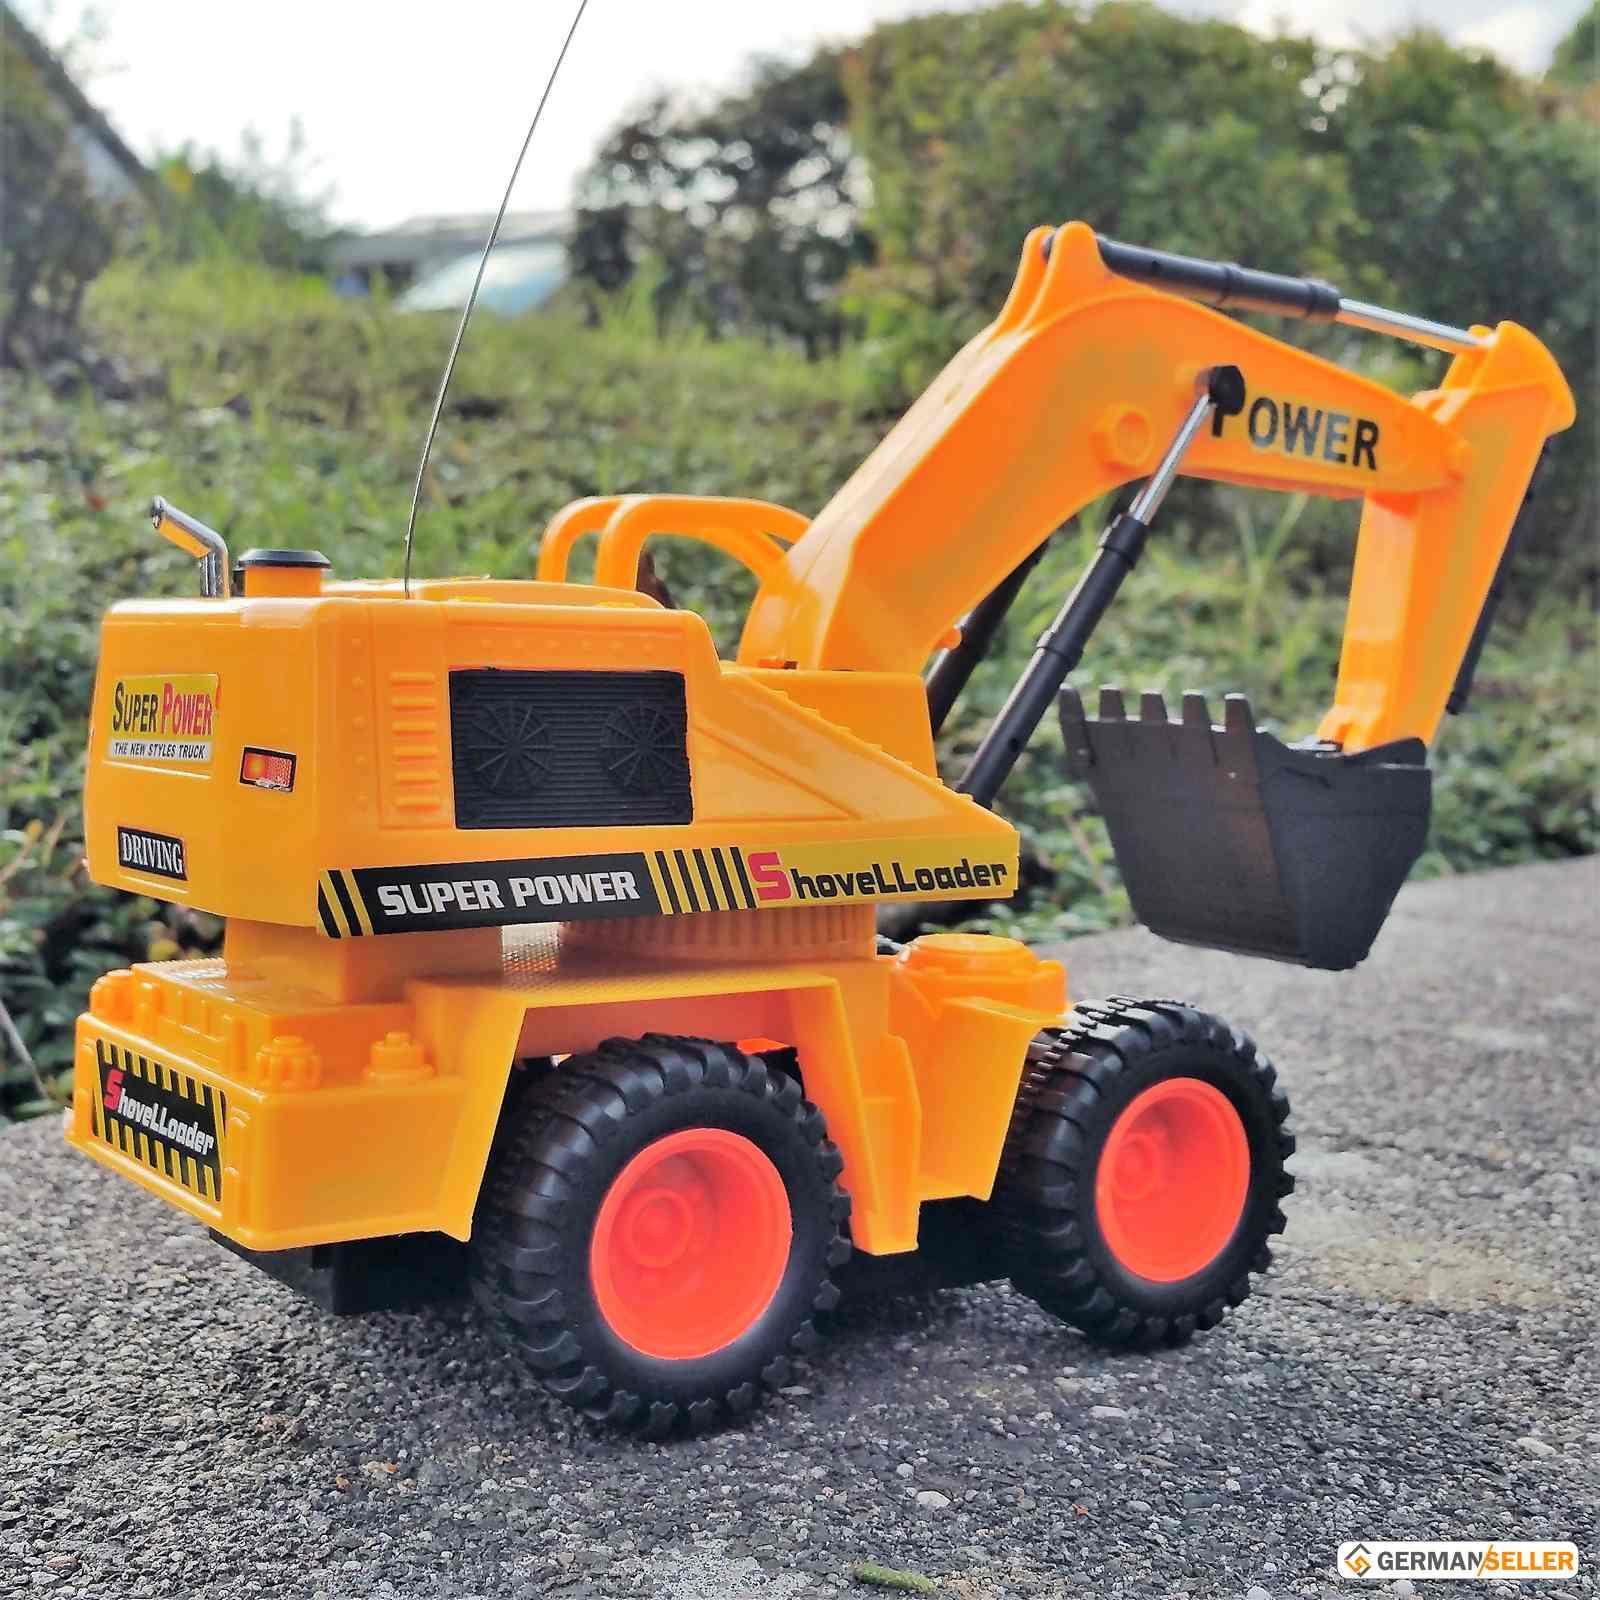 germanseller - ferngesteuertes kinder spielzeug rc cars modellbau toys